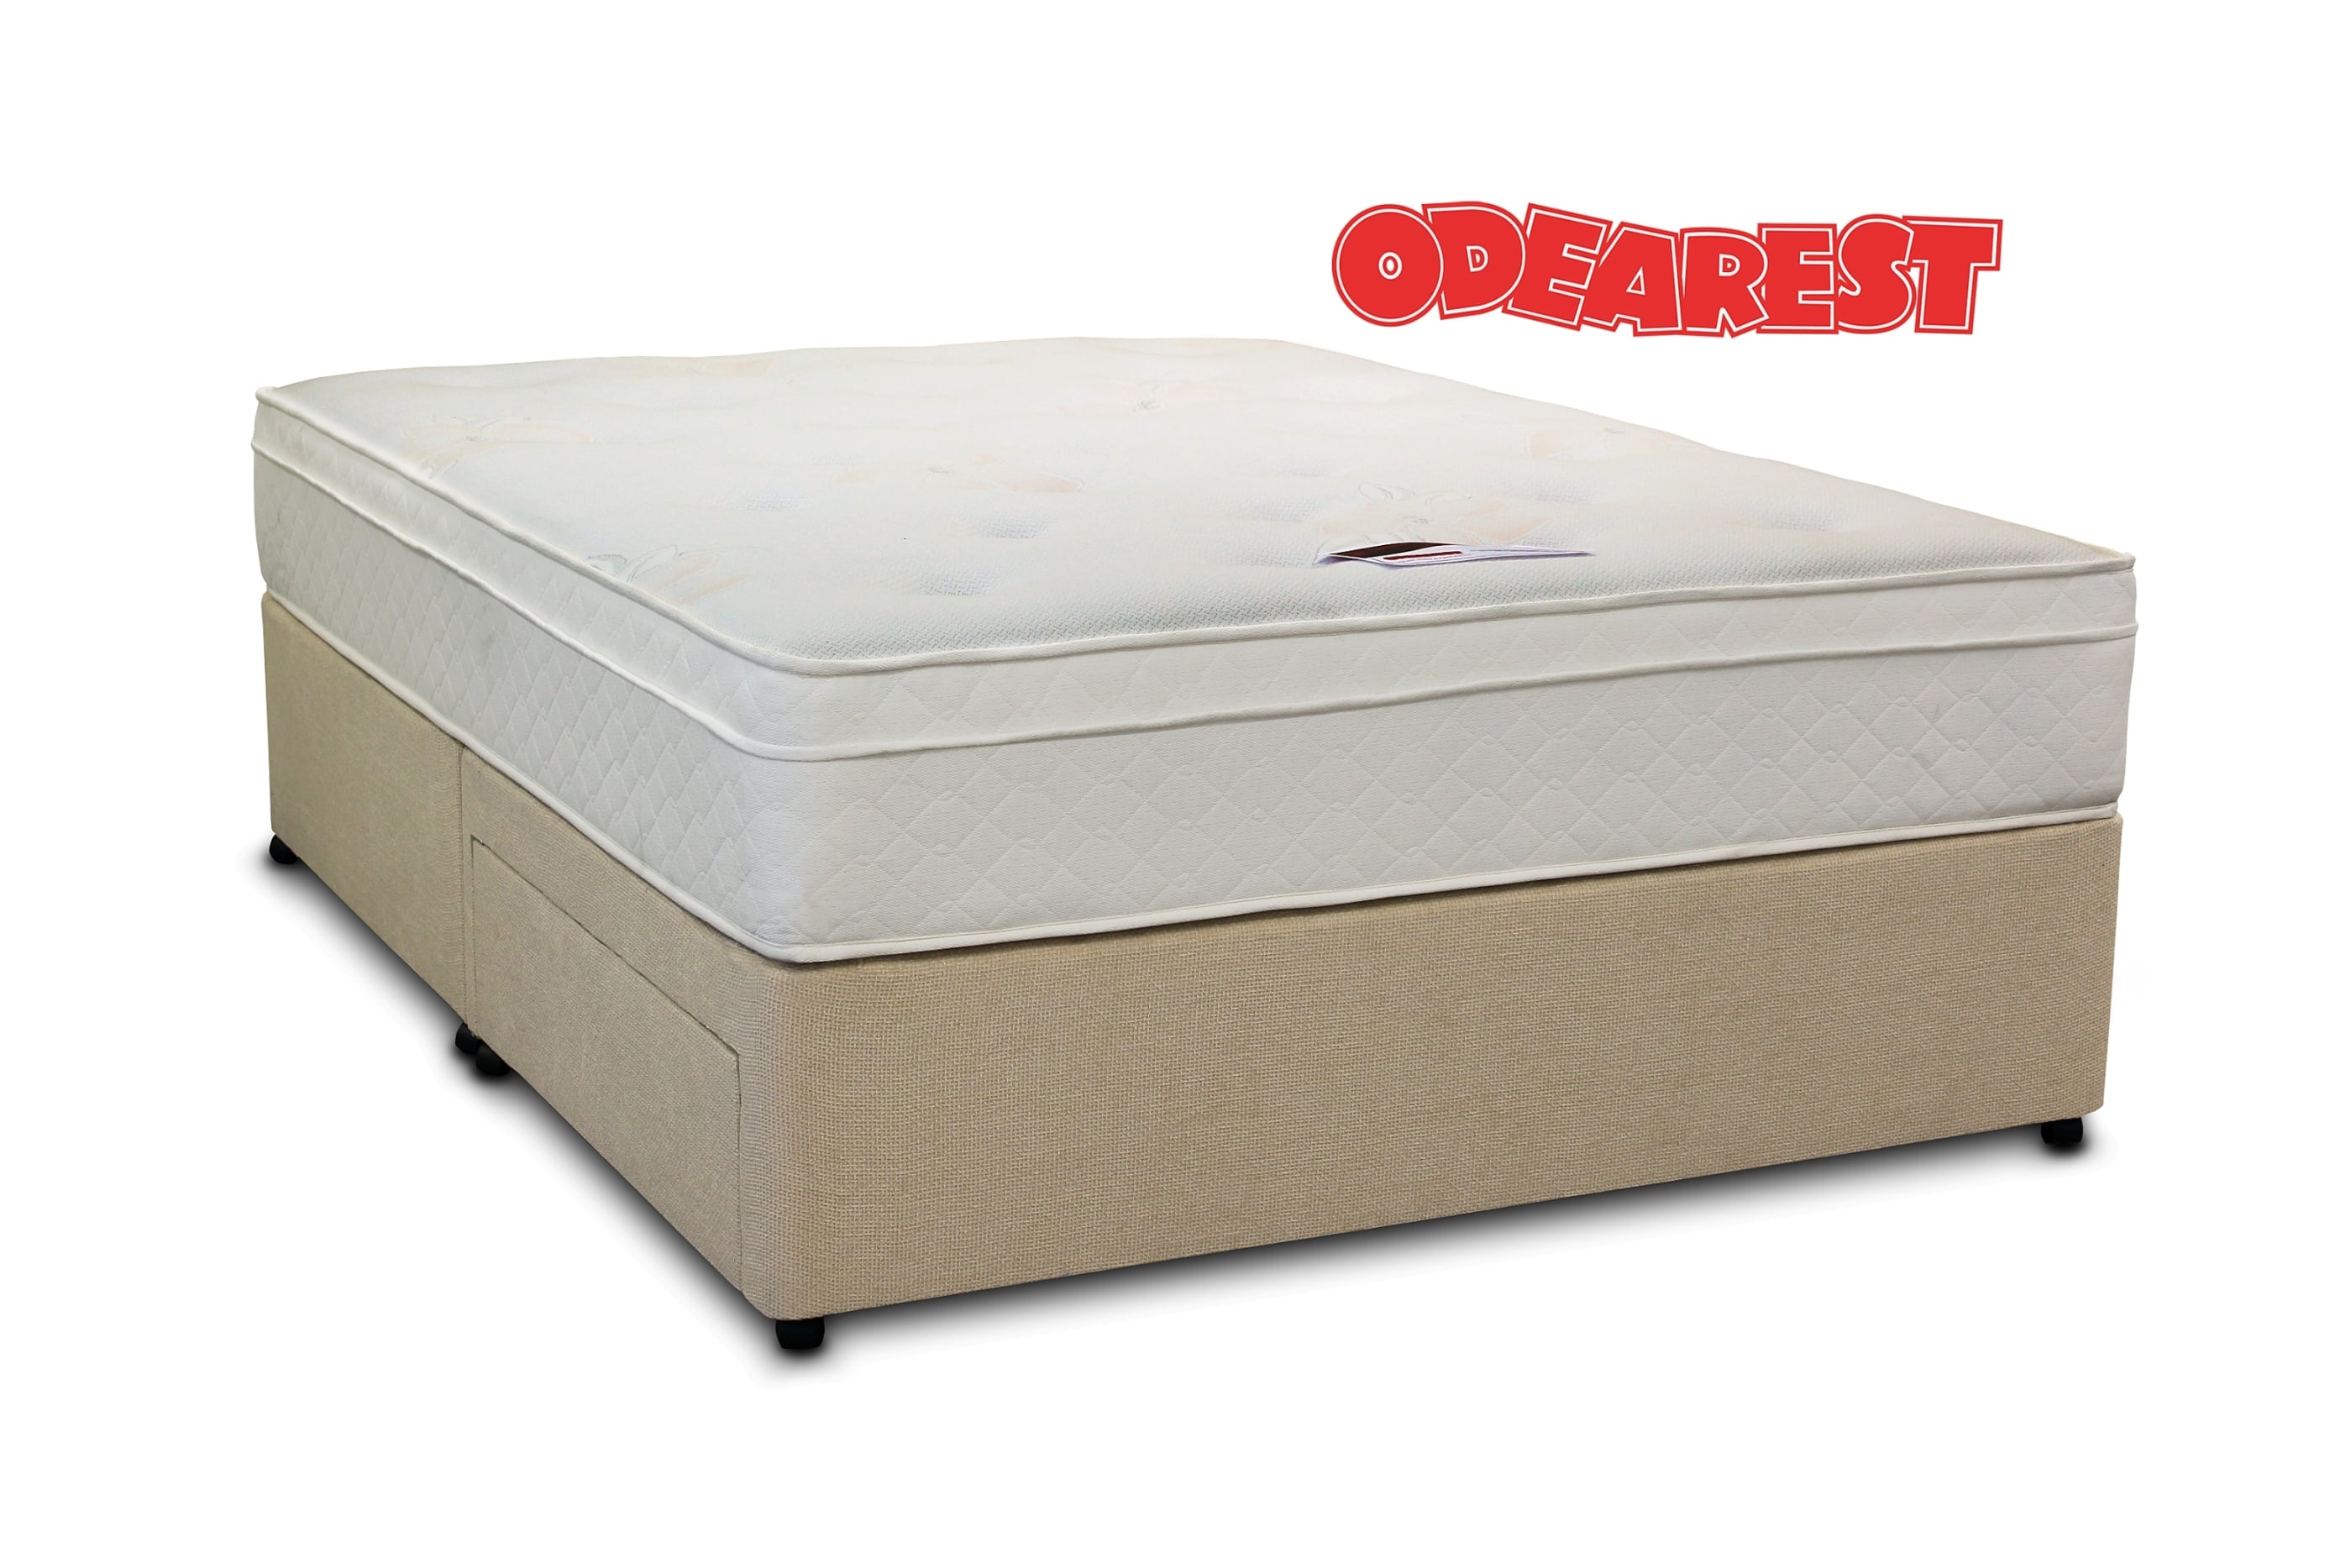 Odearest 3' Orchid Pocket Divan Bed